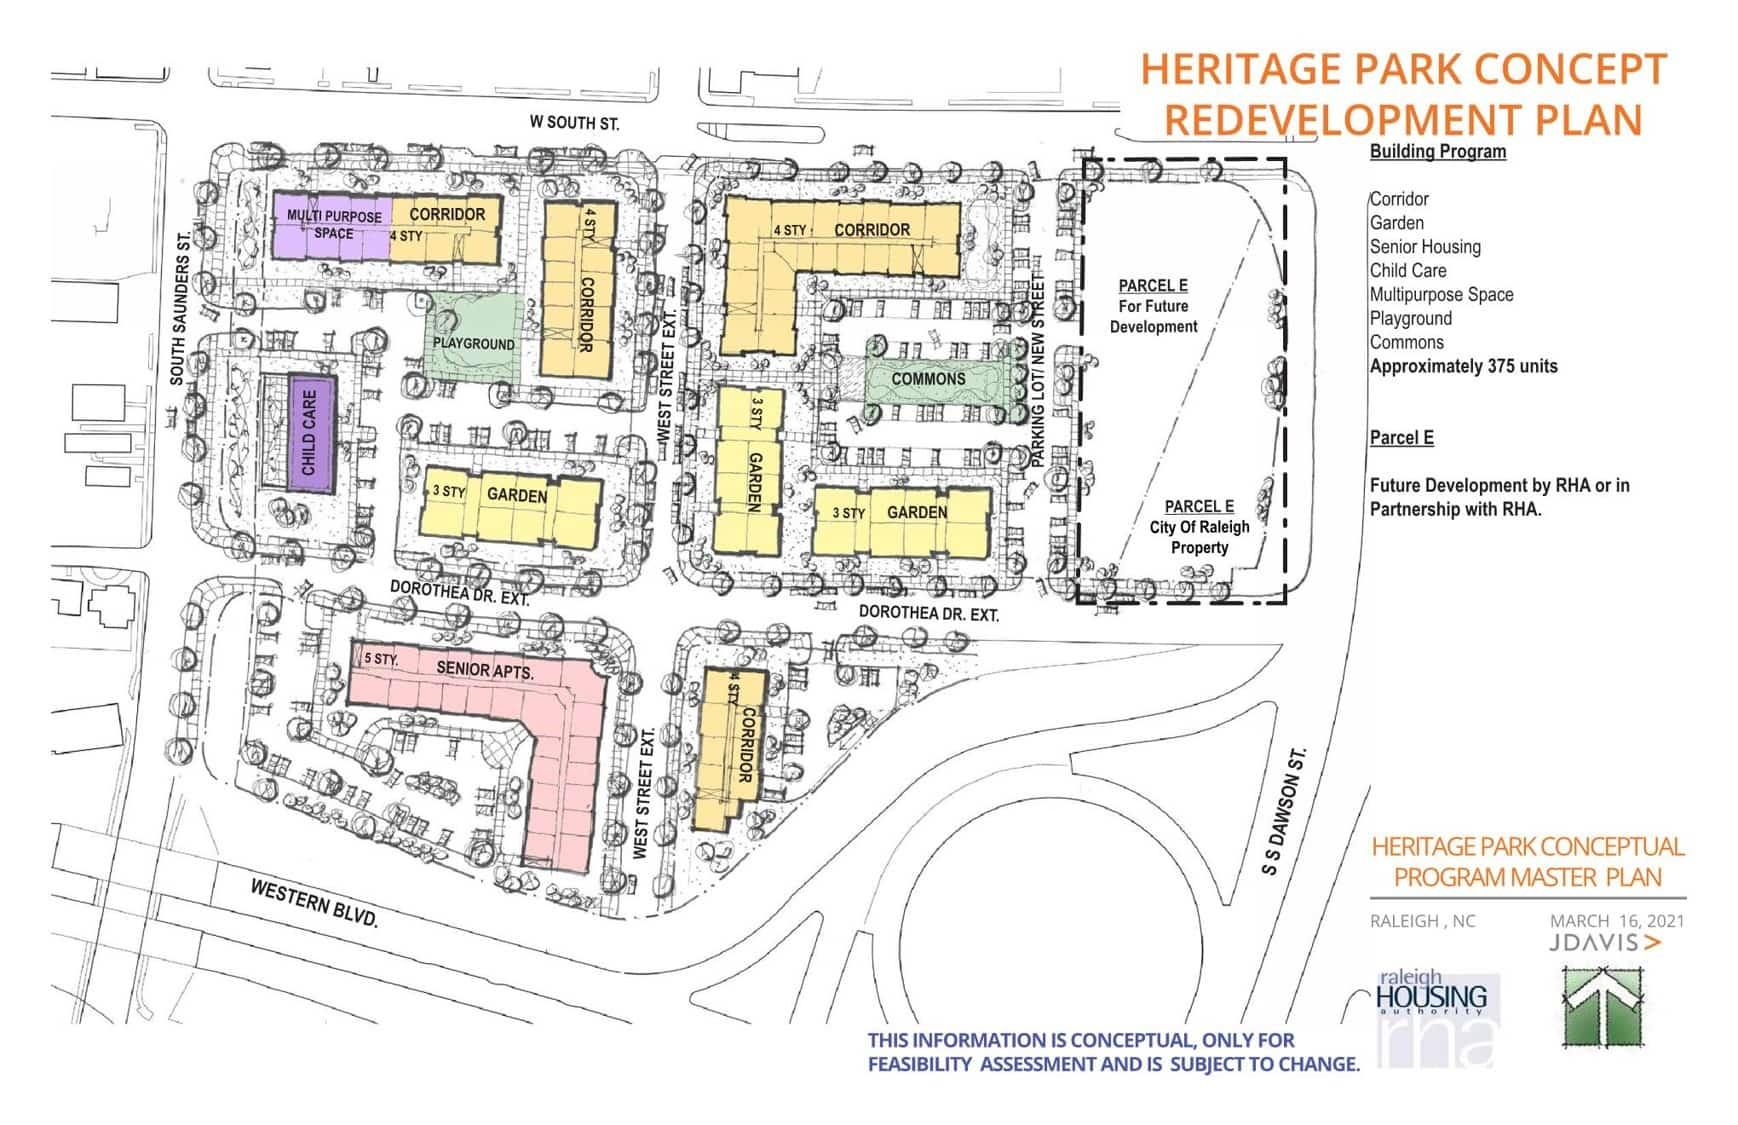 Heritage Park Concept Redevelopment Plan